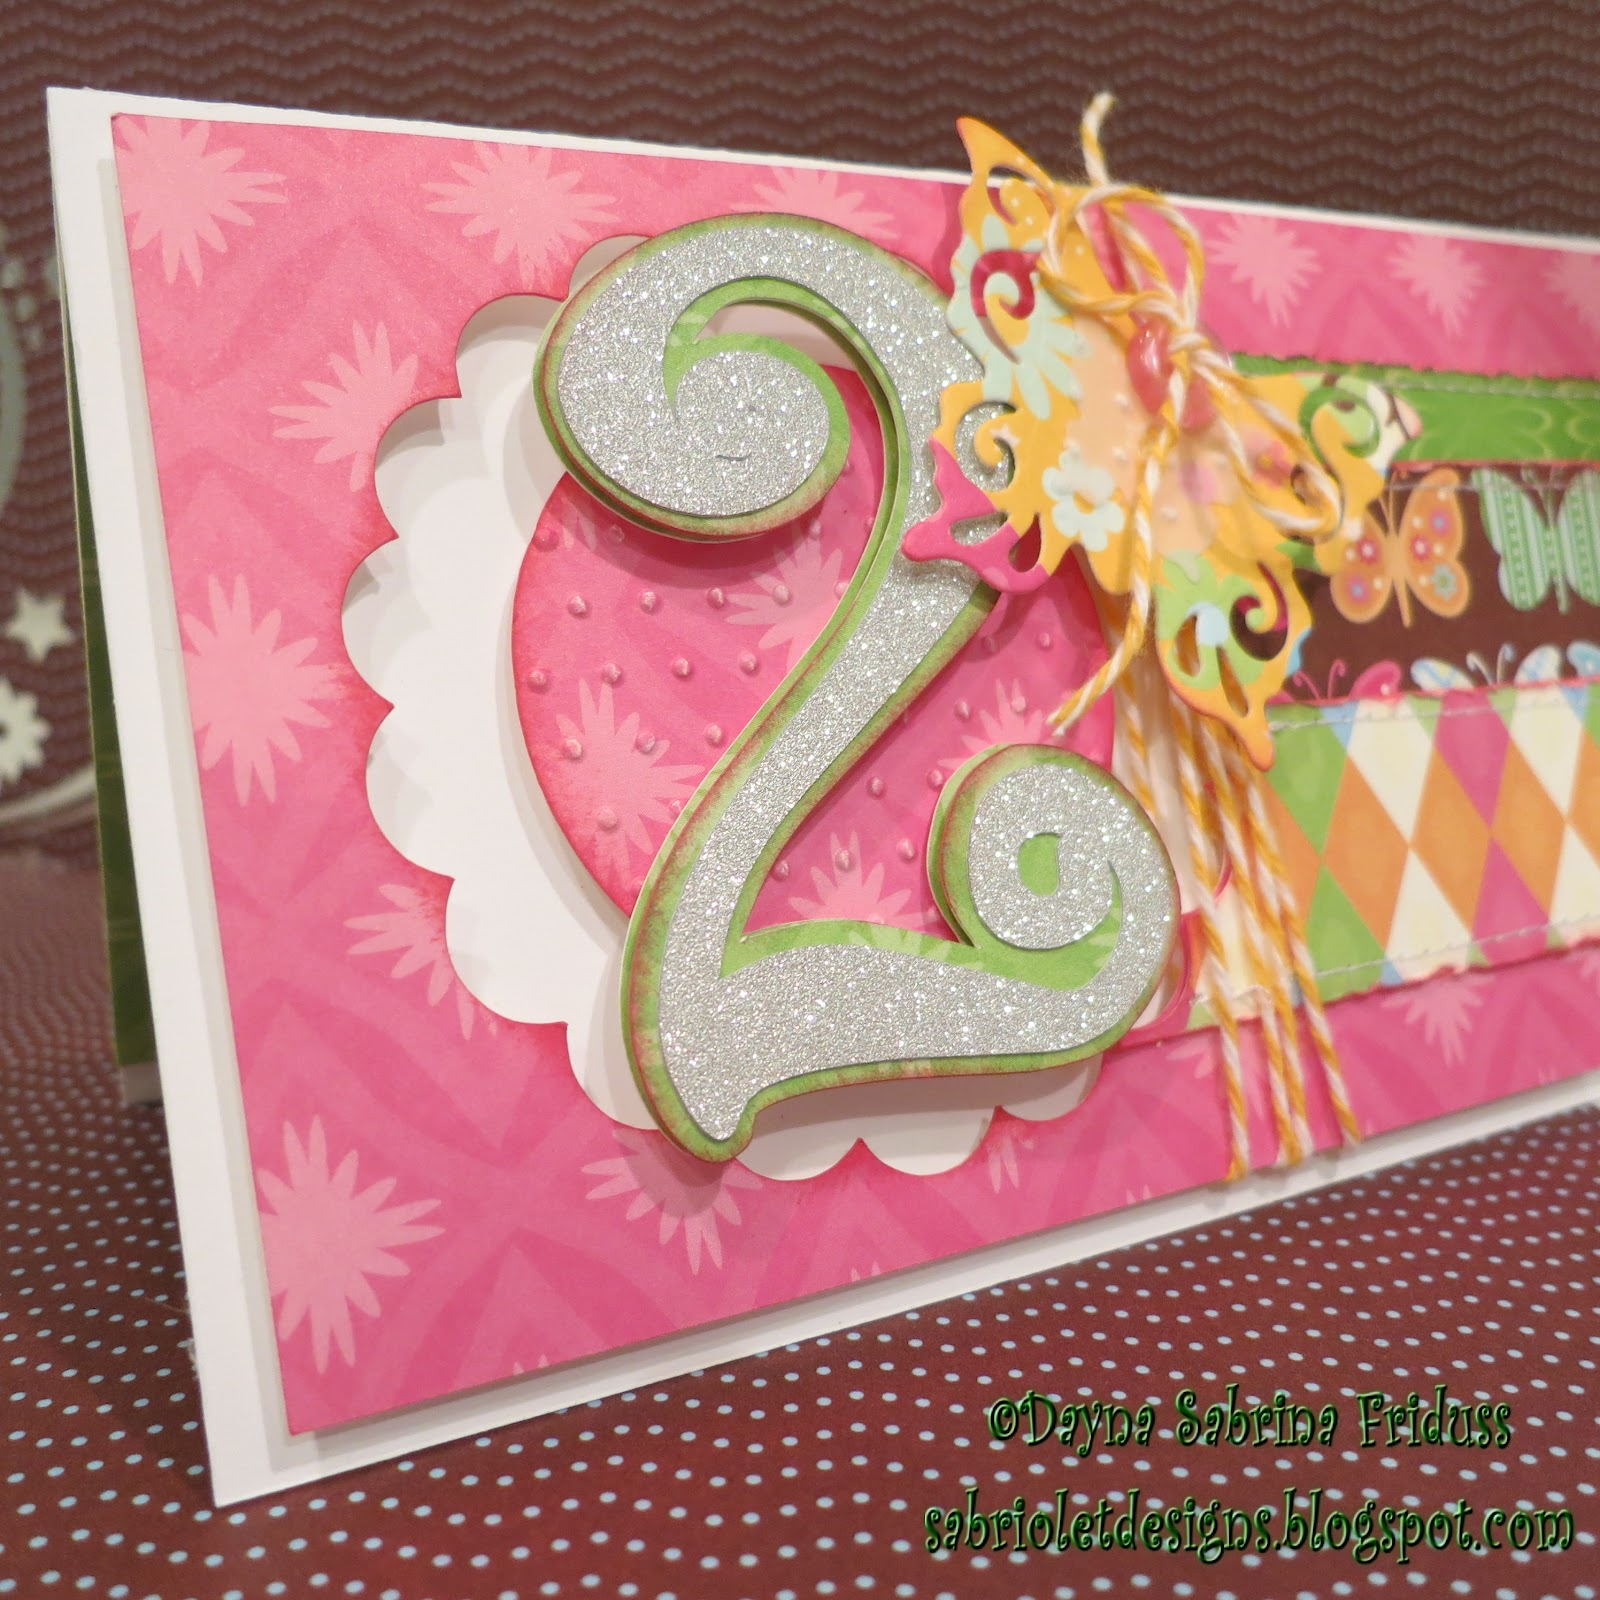 Sabriolet Designs: Happy 2nd Birthday